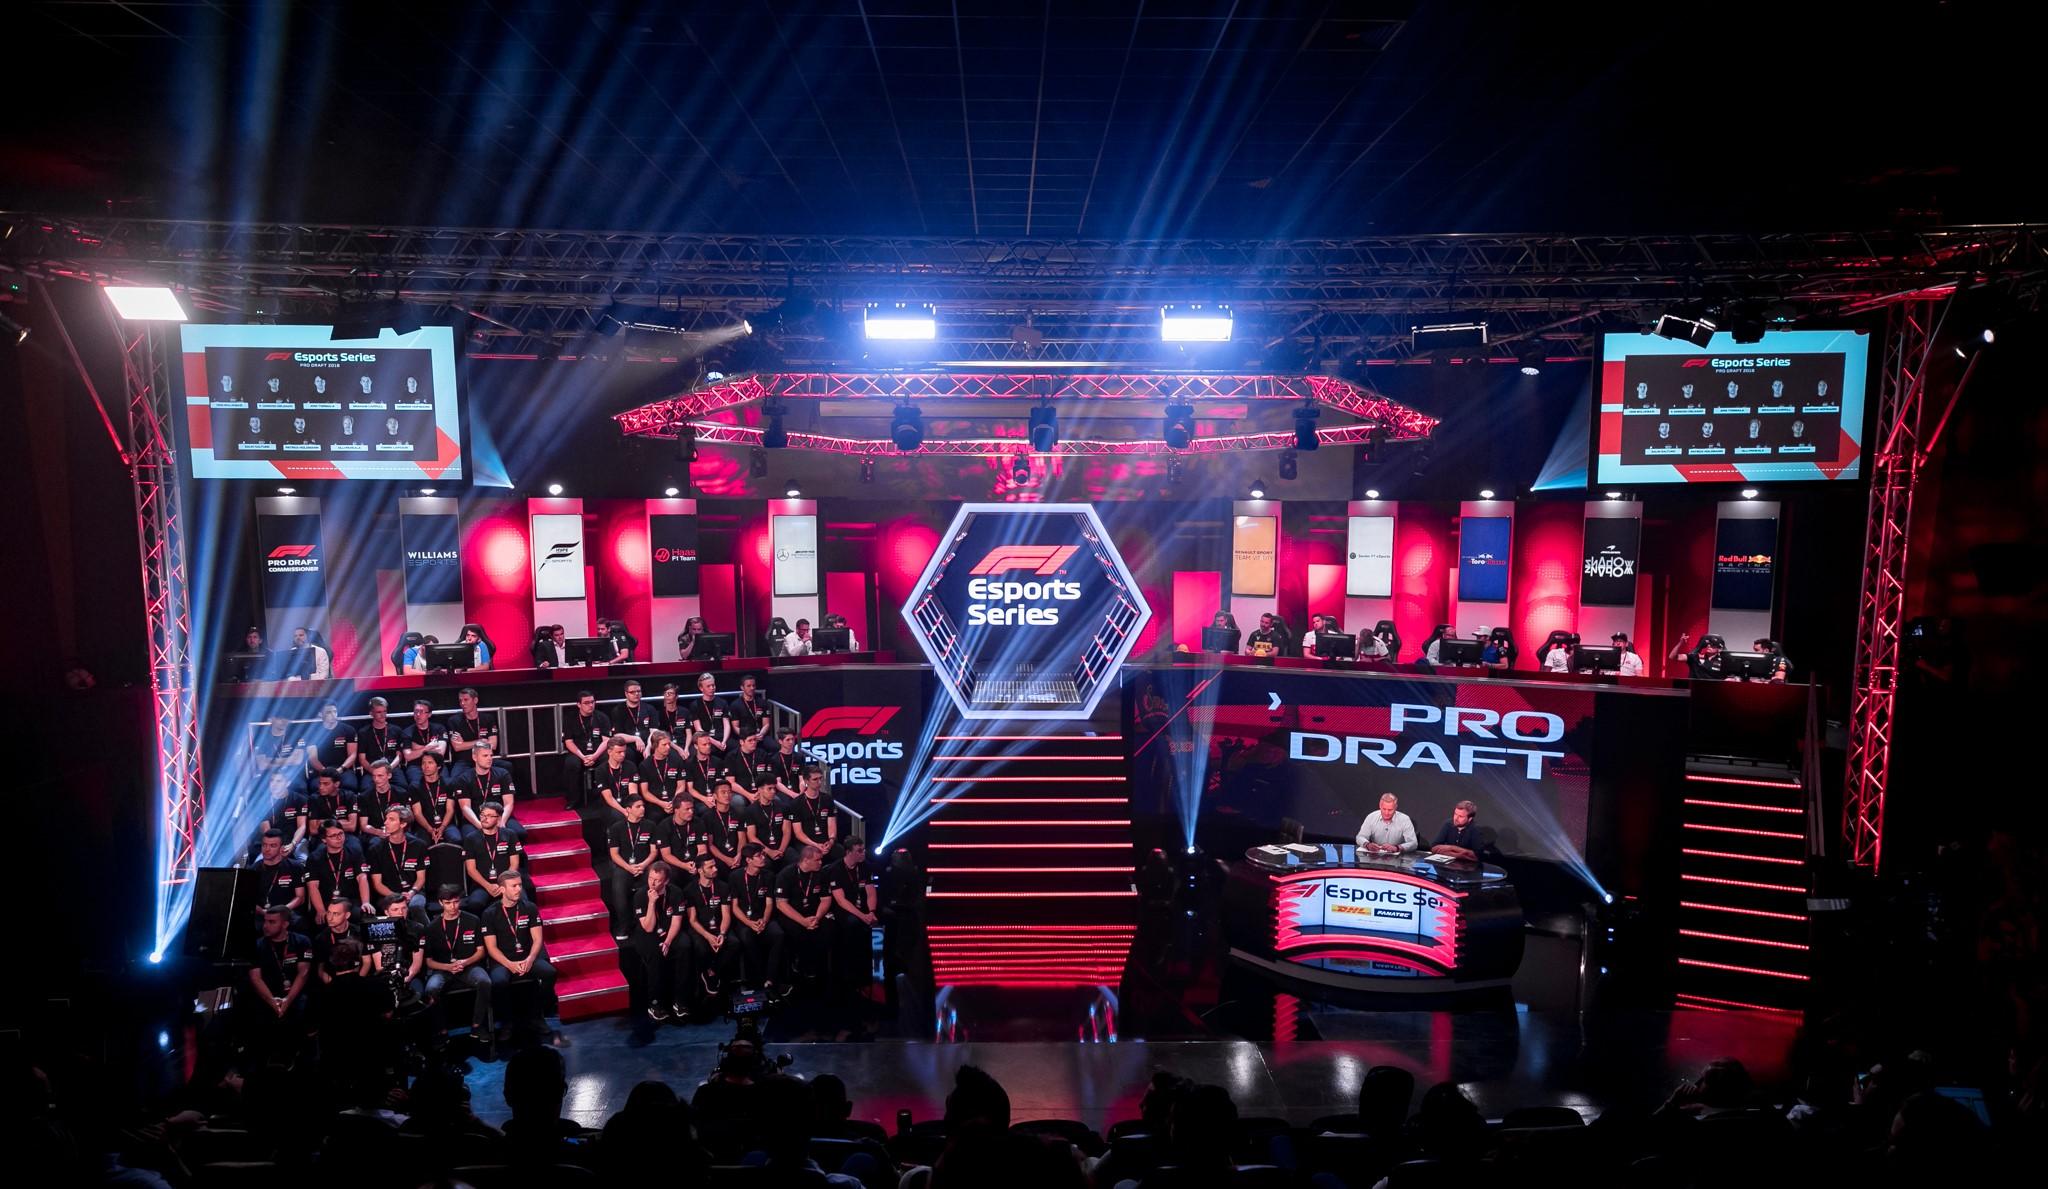 F1 Esports 2018 Draft - Gfinity Arena